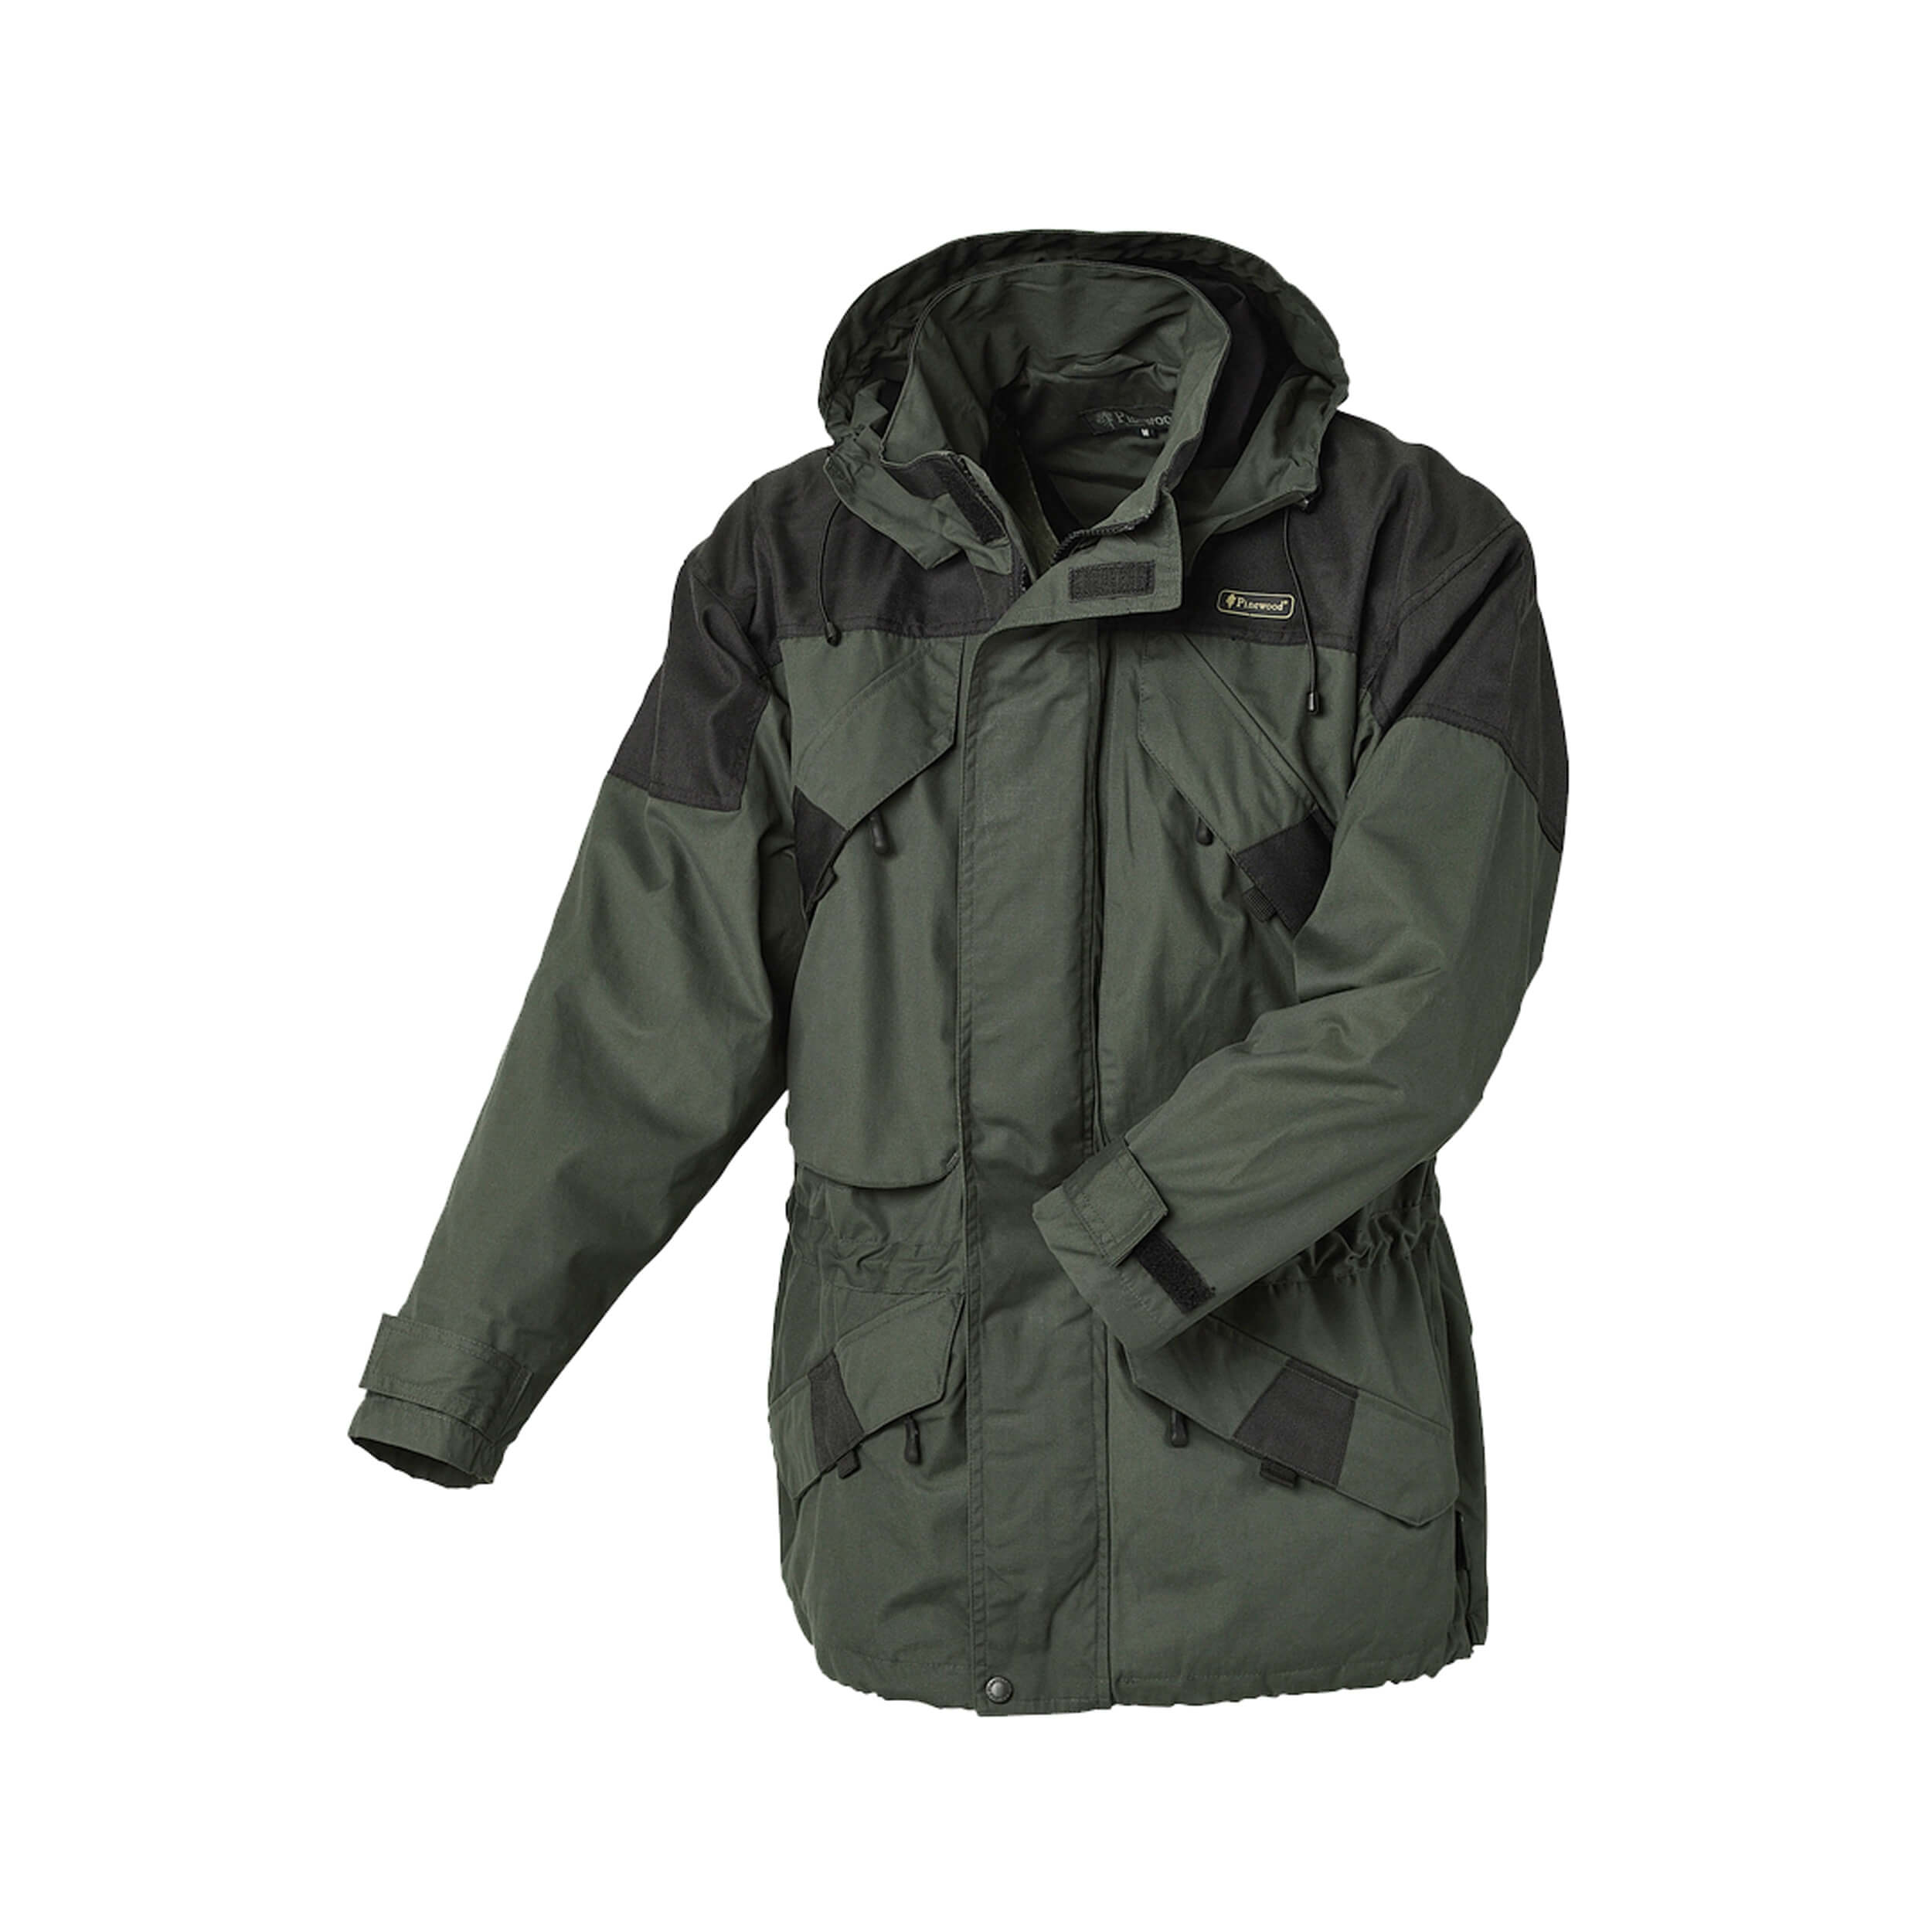 Pinewood Lappland Extreme Jacke Dunkelgrün schwarz